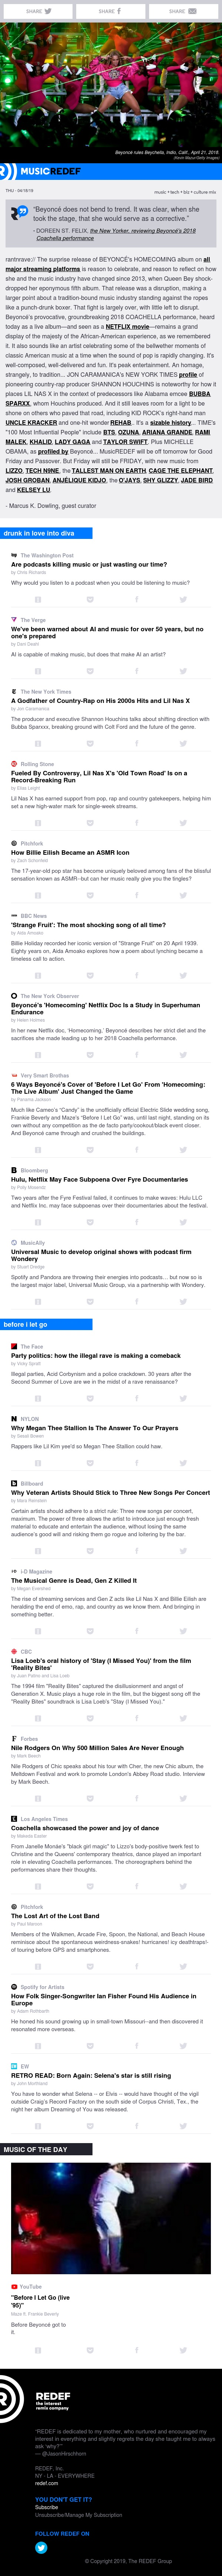 jason hirschhorn's @MusicREDEF: 04/18/2019 - Surprise: It's Beyoncé, Are Podcasts Killing Music?, Country-Rap Godfather, Billie Eilish, 'Strange Fruit'...